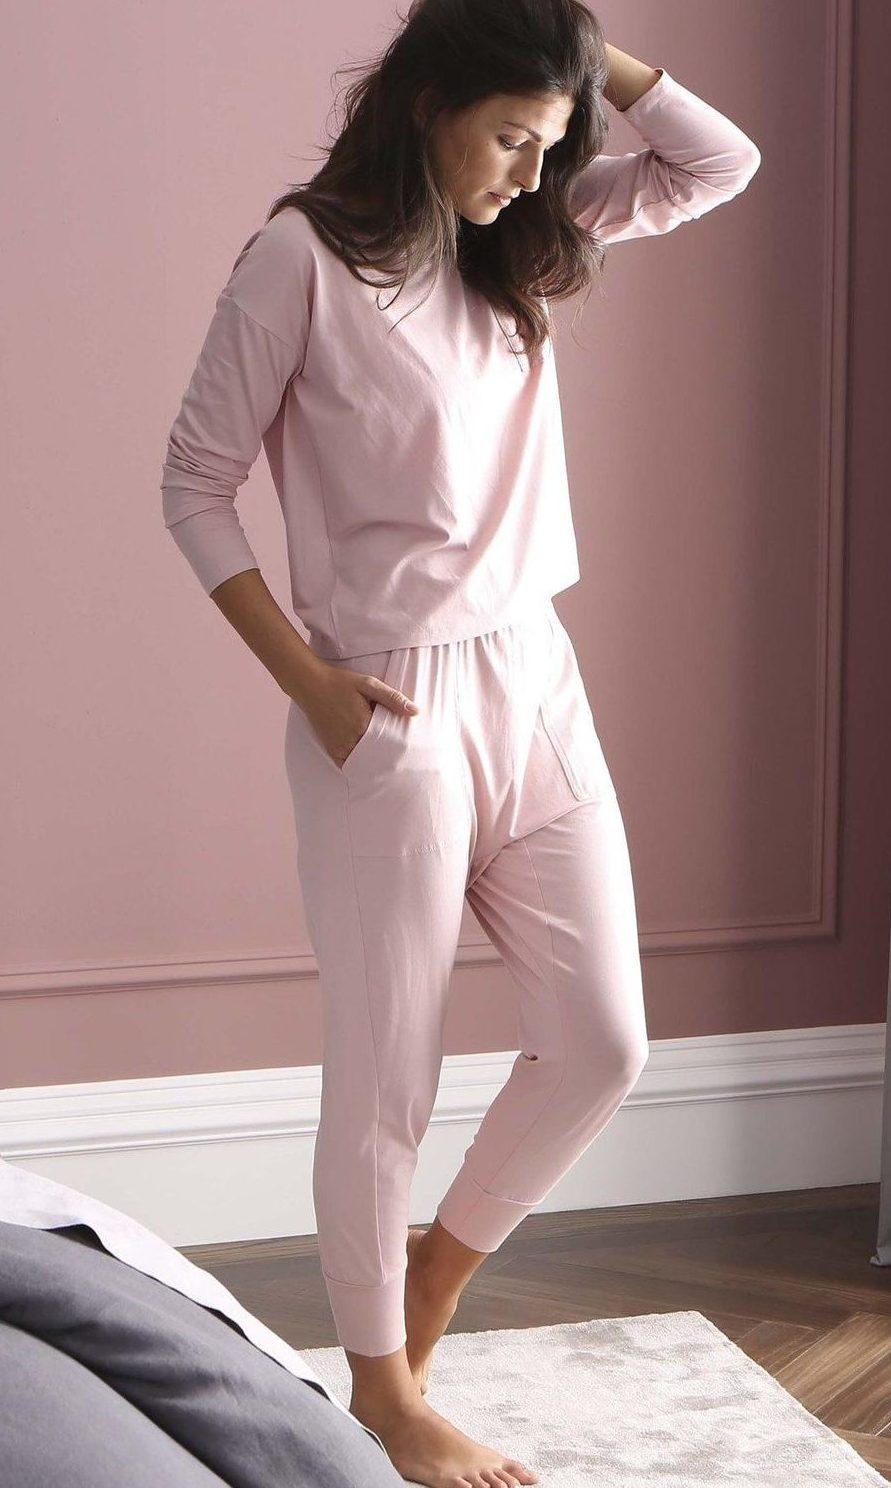 Womens pajamas linen sleepwear linen shorts women linen womens sleepwear pyjama linen linen pajama set linen lounge wear linen night